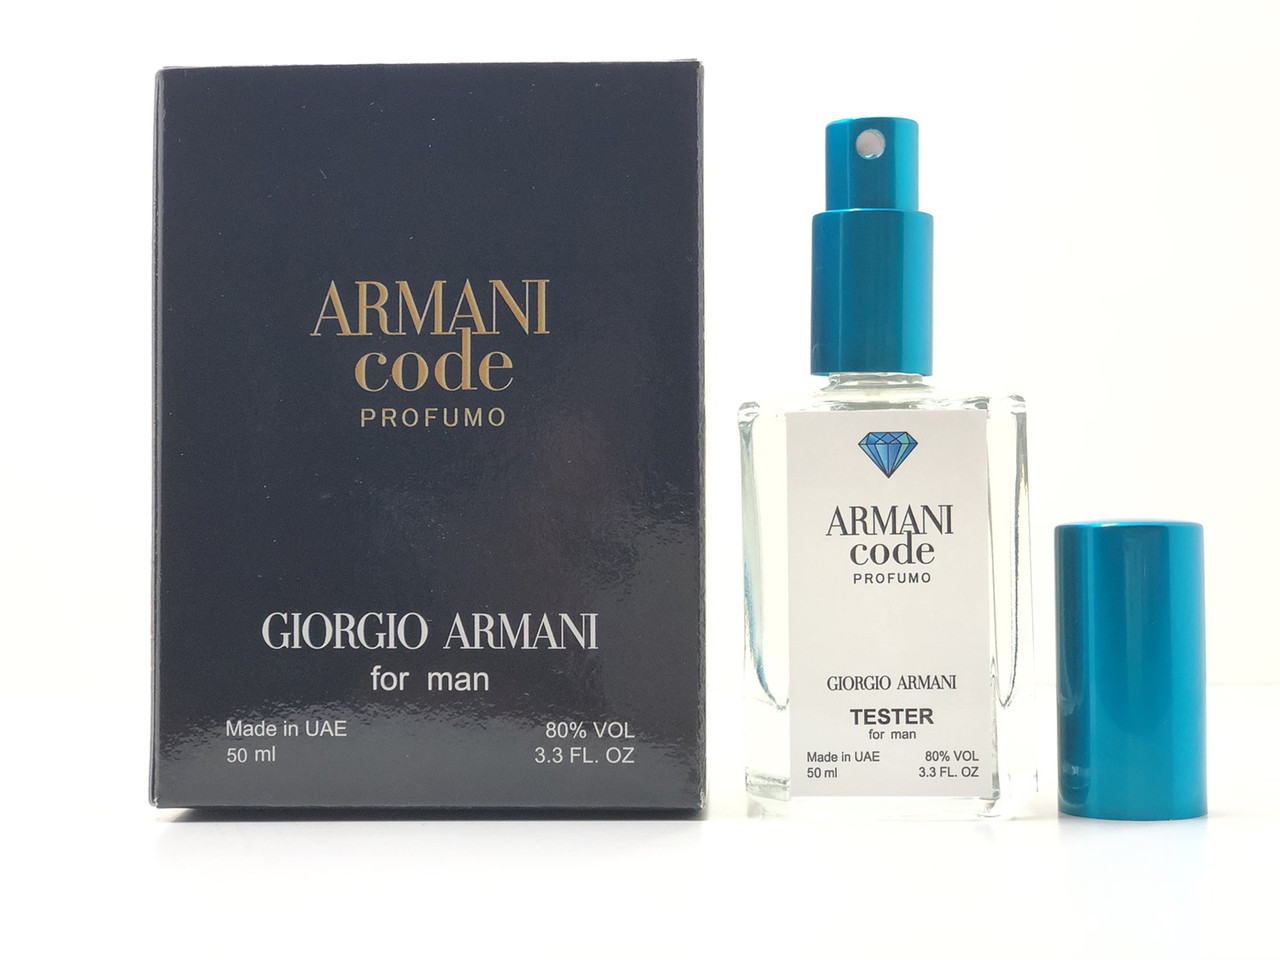 Парфюм Giorgio Armani Code Profumo (Джорджио Армани Код Профумо) 50 мл Diamond - реплика